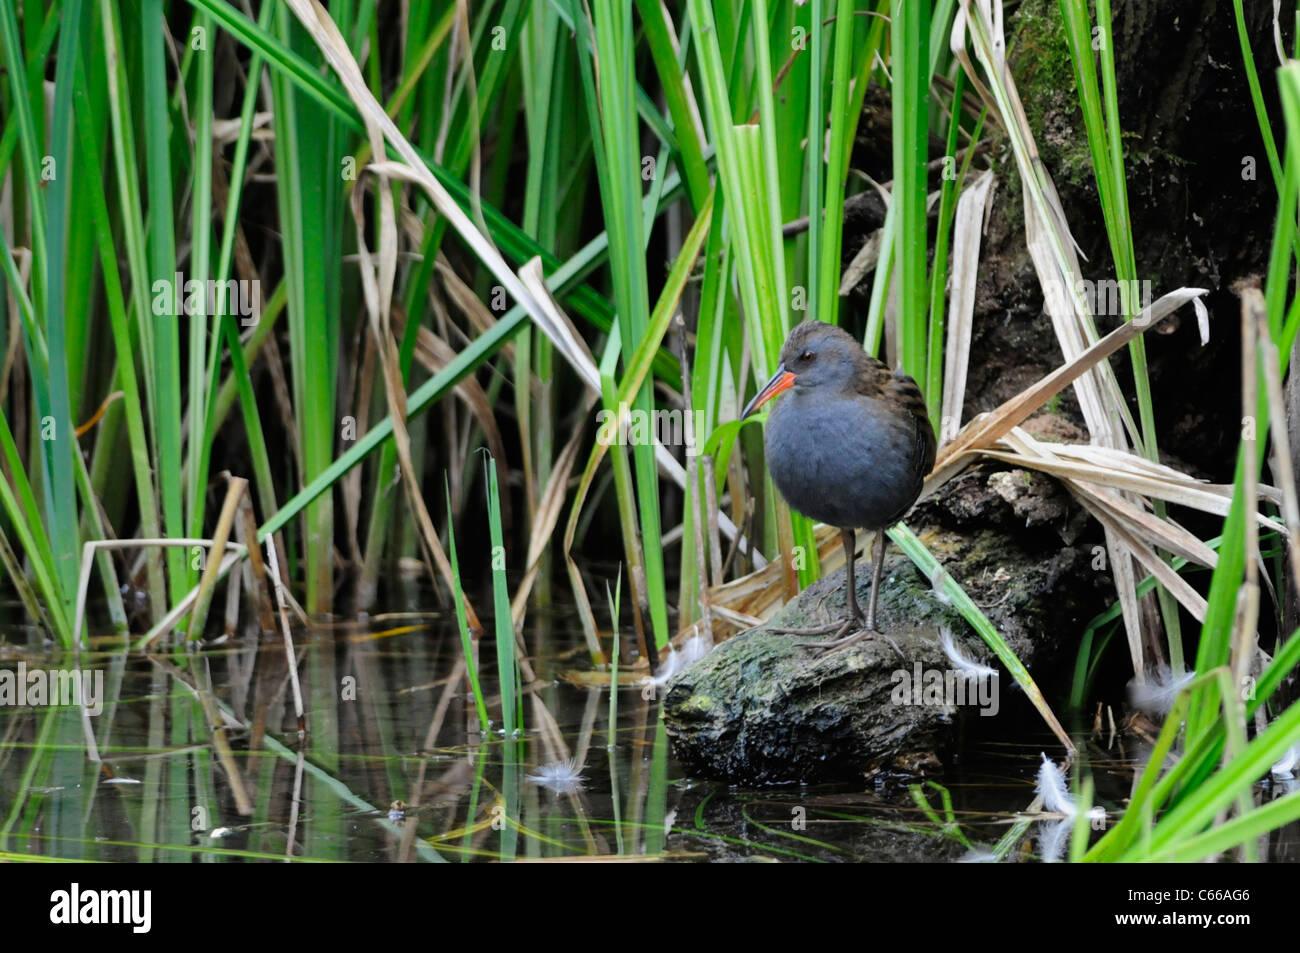 Water Rail Rallus aquaticus, Fowlmere RSPB Reserve, Cambridgeshire, England, UK - Stock Image